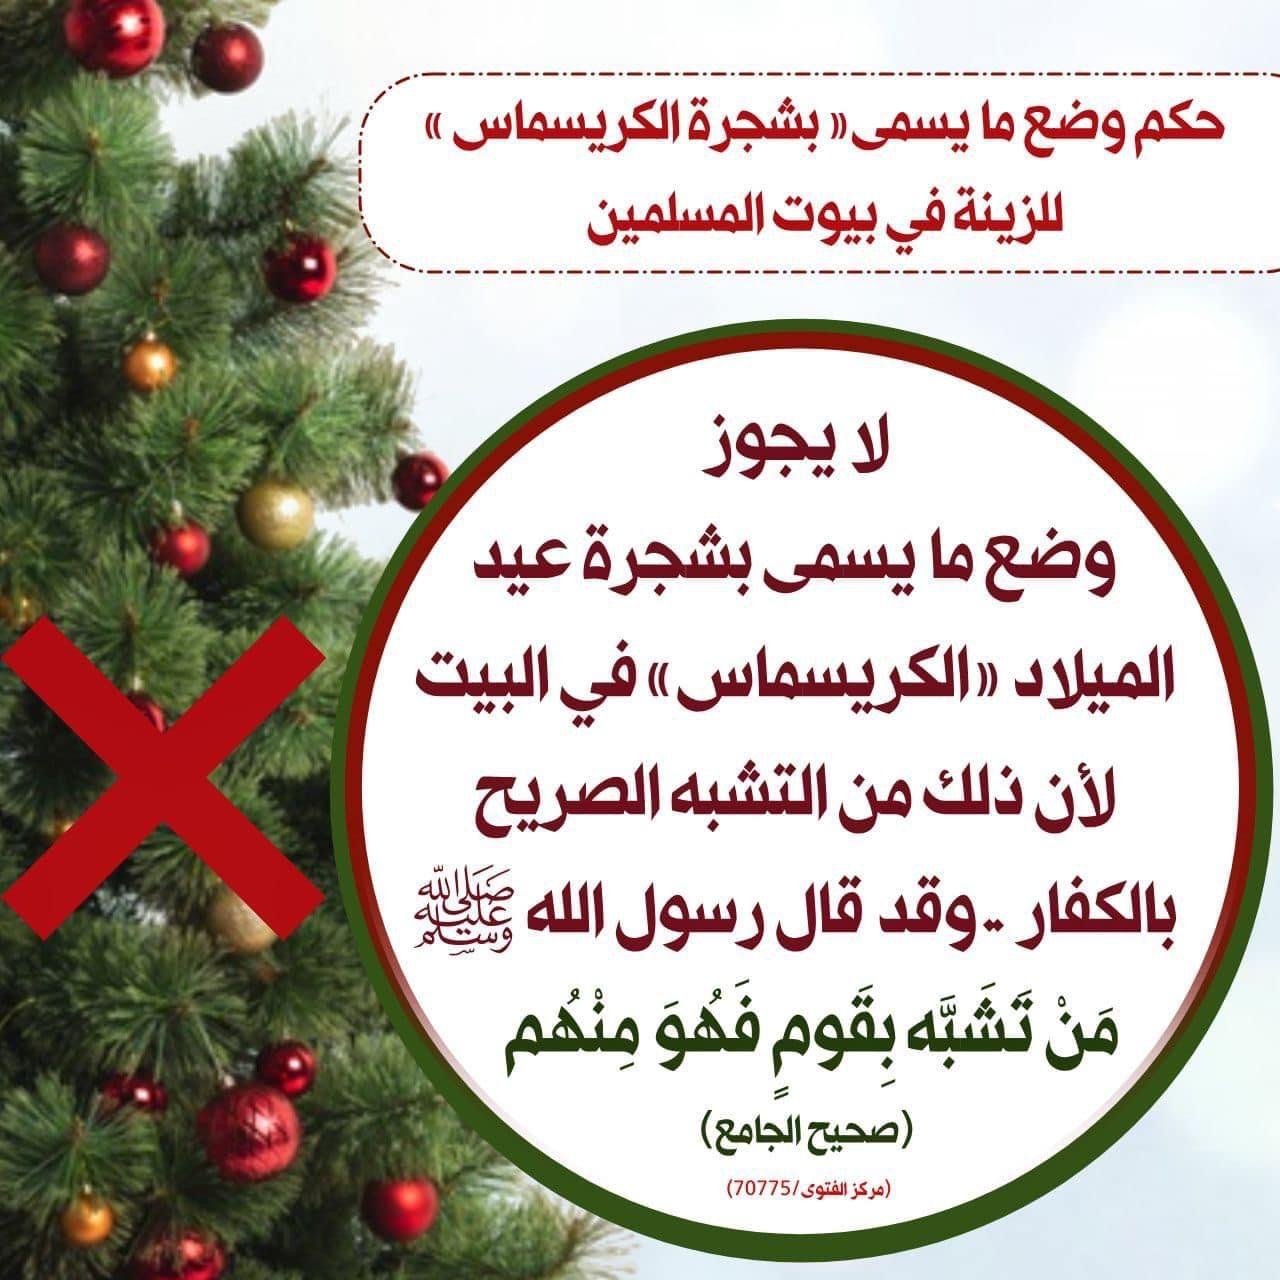 Pin By الأثر الجميل On فتاوى Holiday Decor Christmas Tree Skirt Holiday